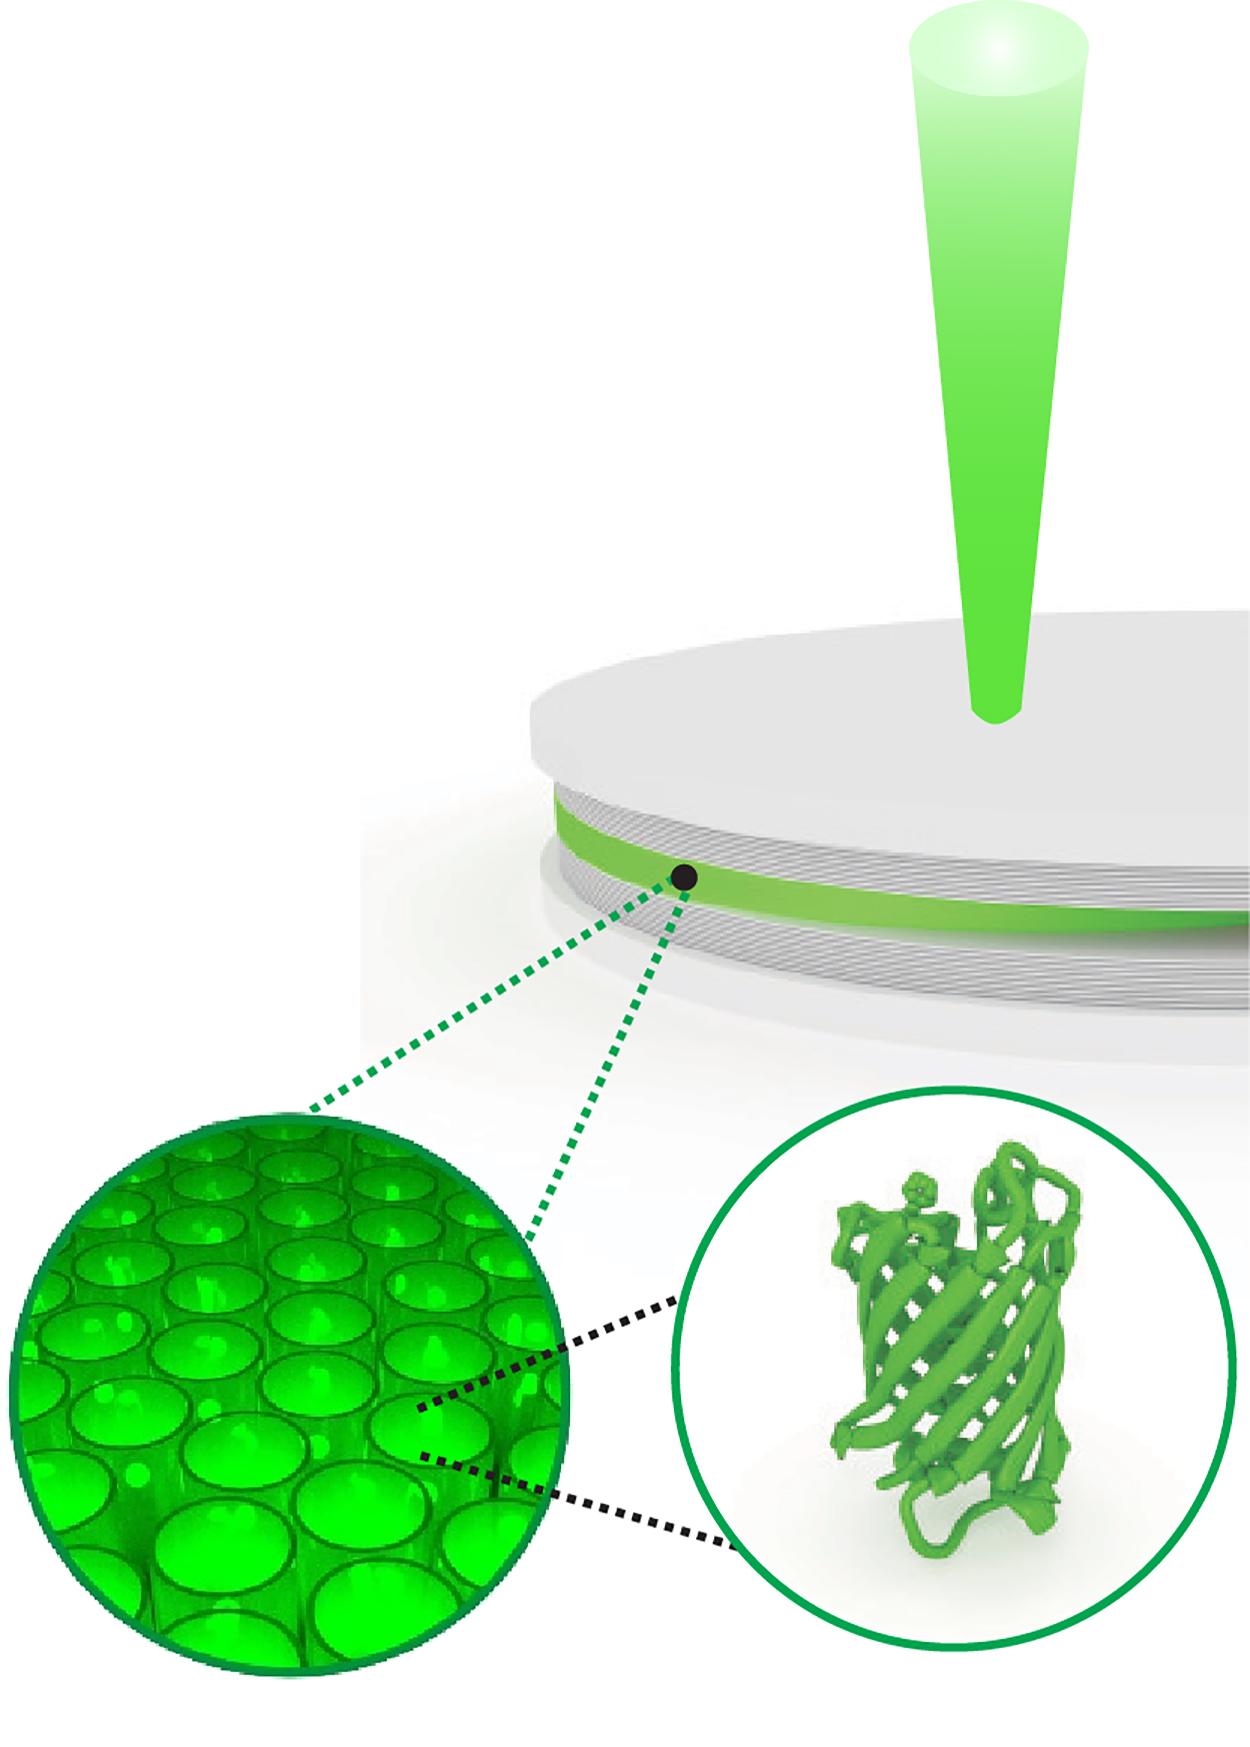 Jellyfish proteins used to create polariton laser